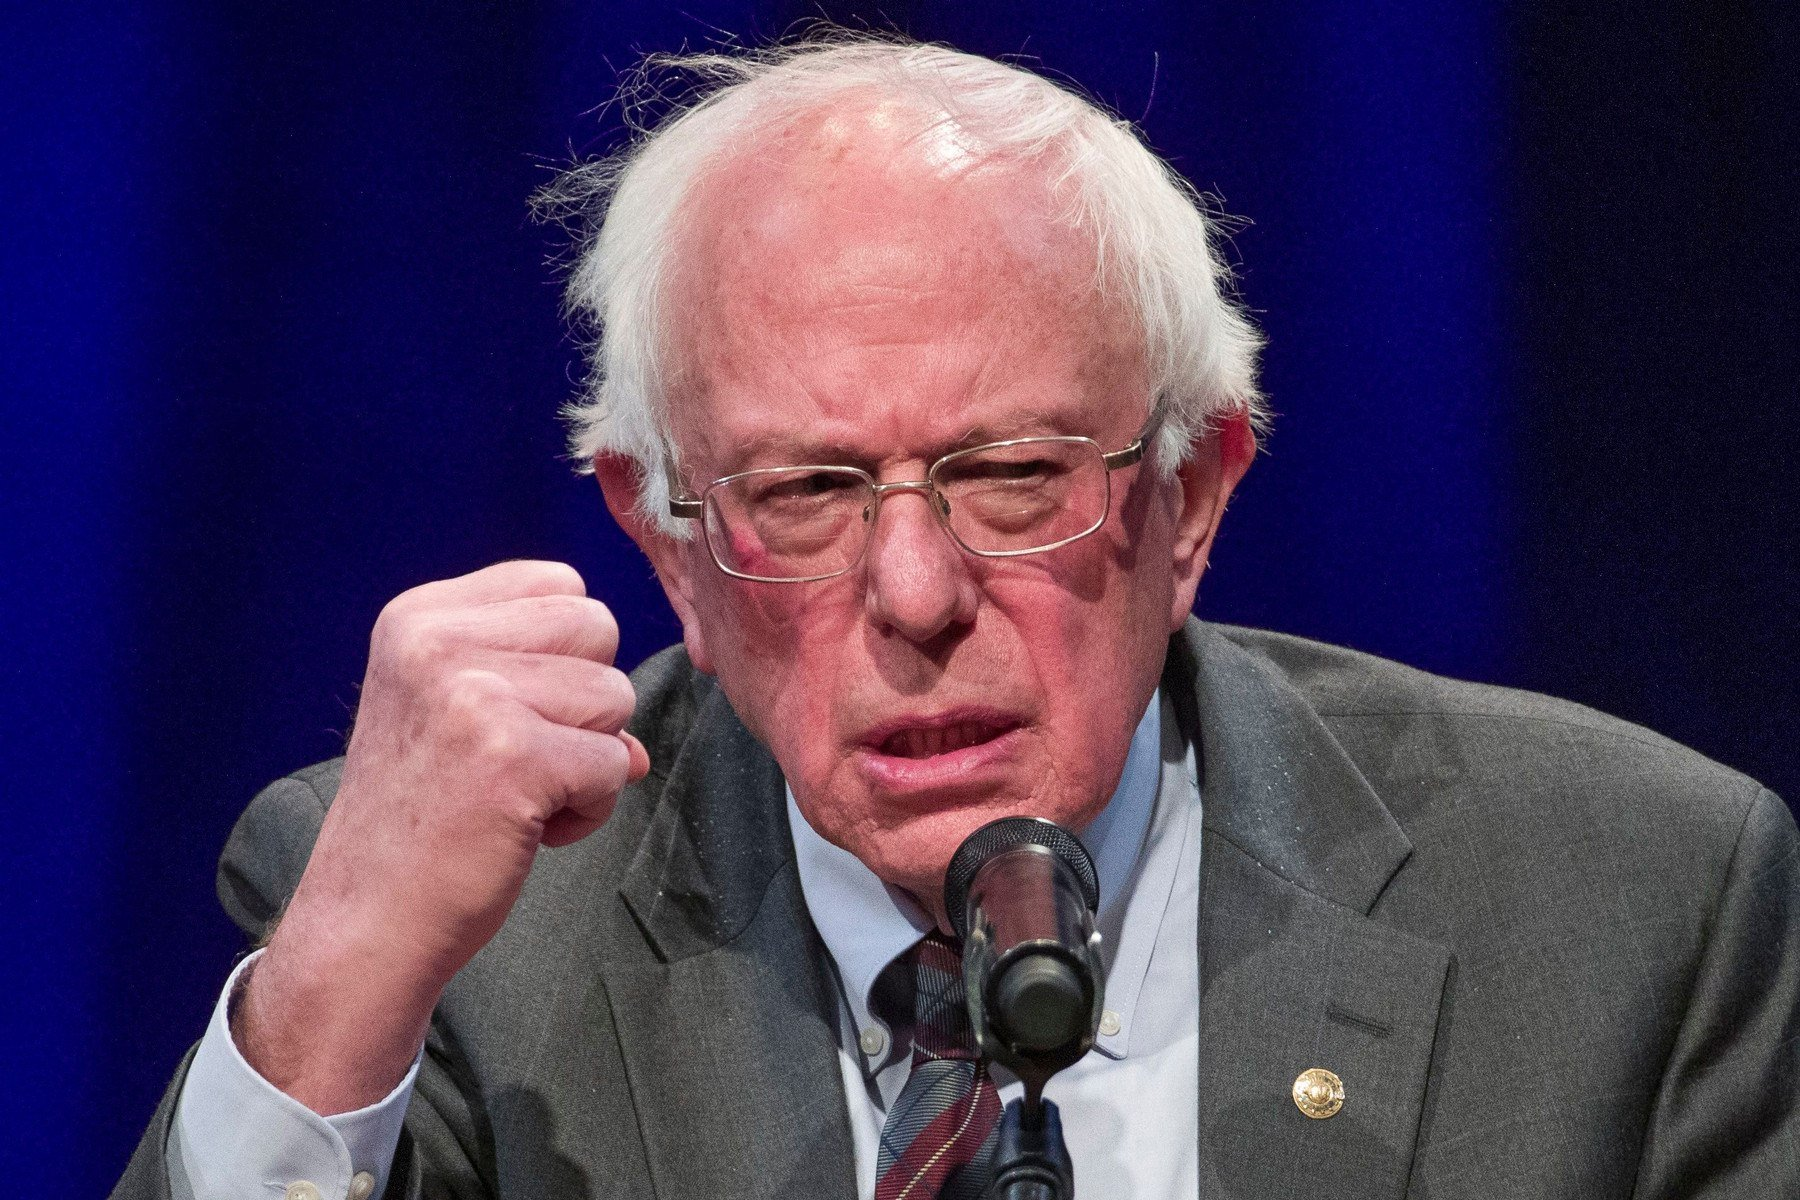 Bernie Sanders 2020 odds politics